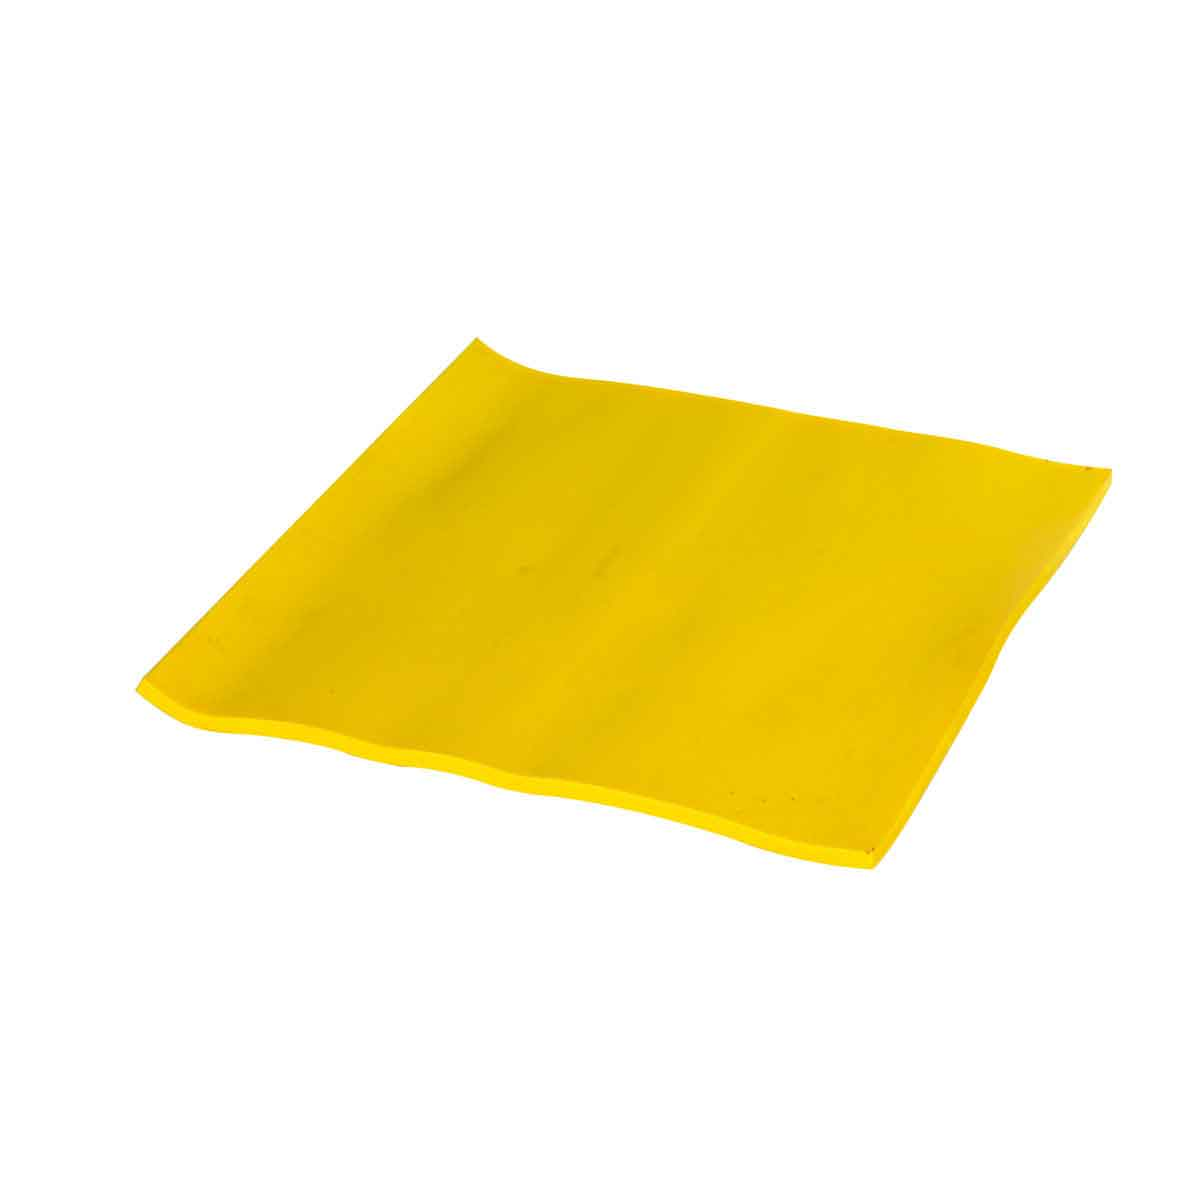 SPC® PVC42 SLIKSTOPPER® Magnetic Tear-Resistant Drain Seal, PVC, Yellow